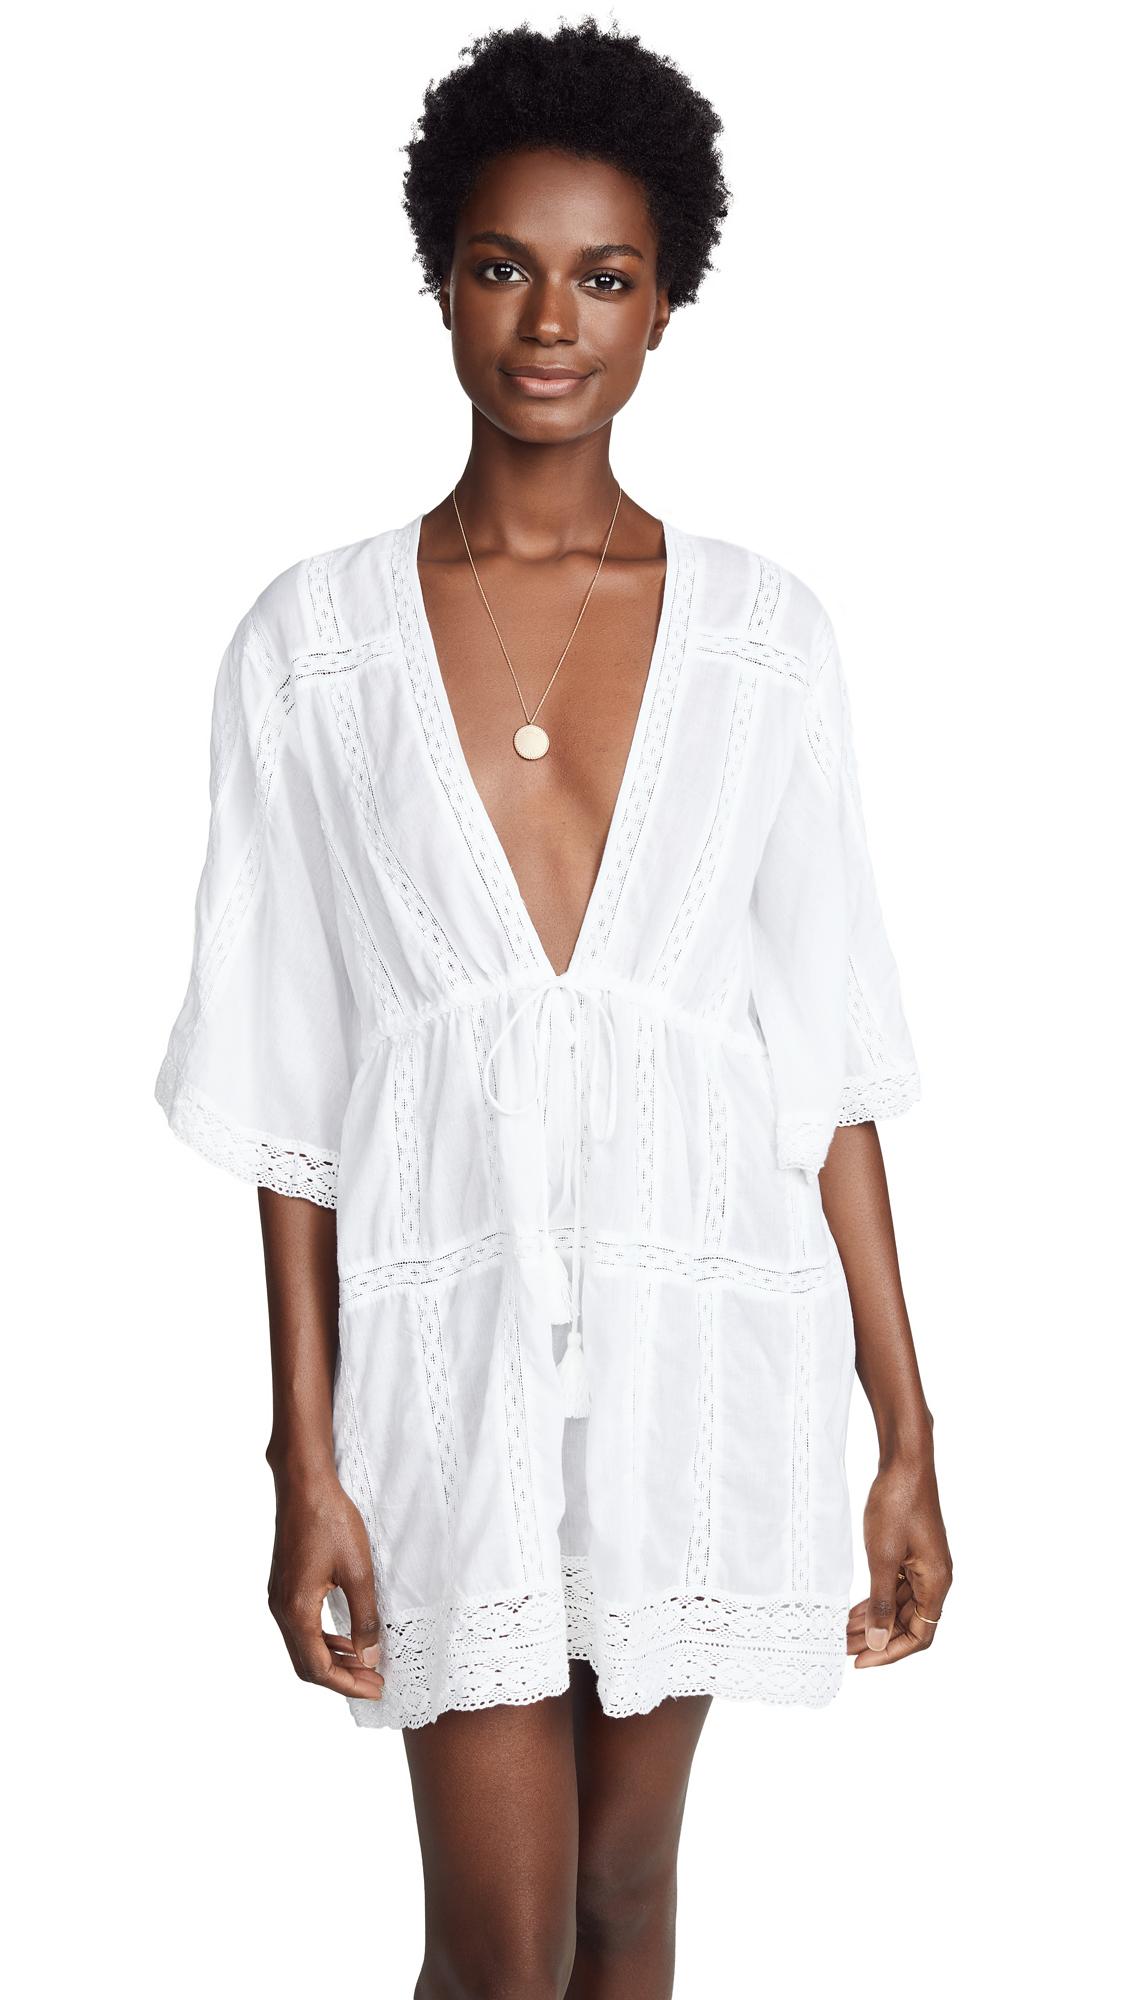 MELISSA ODABASH Jade Cotton Voile Minidress in White